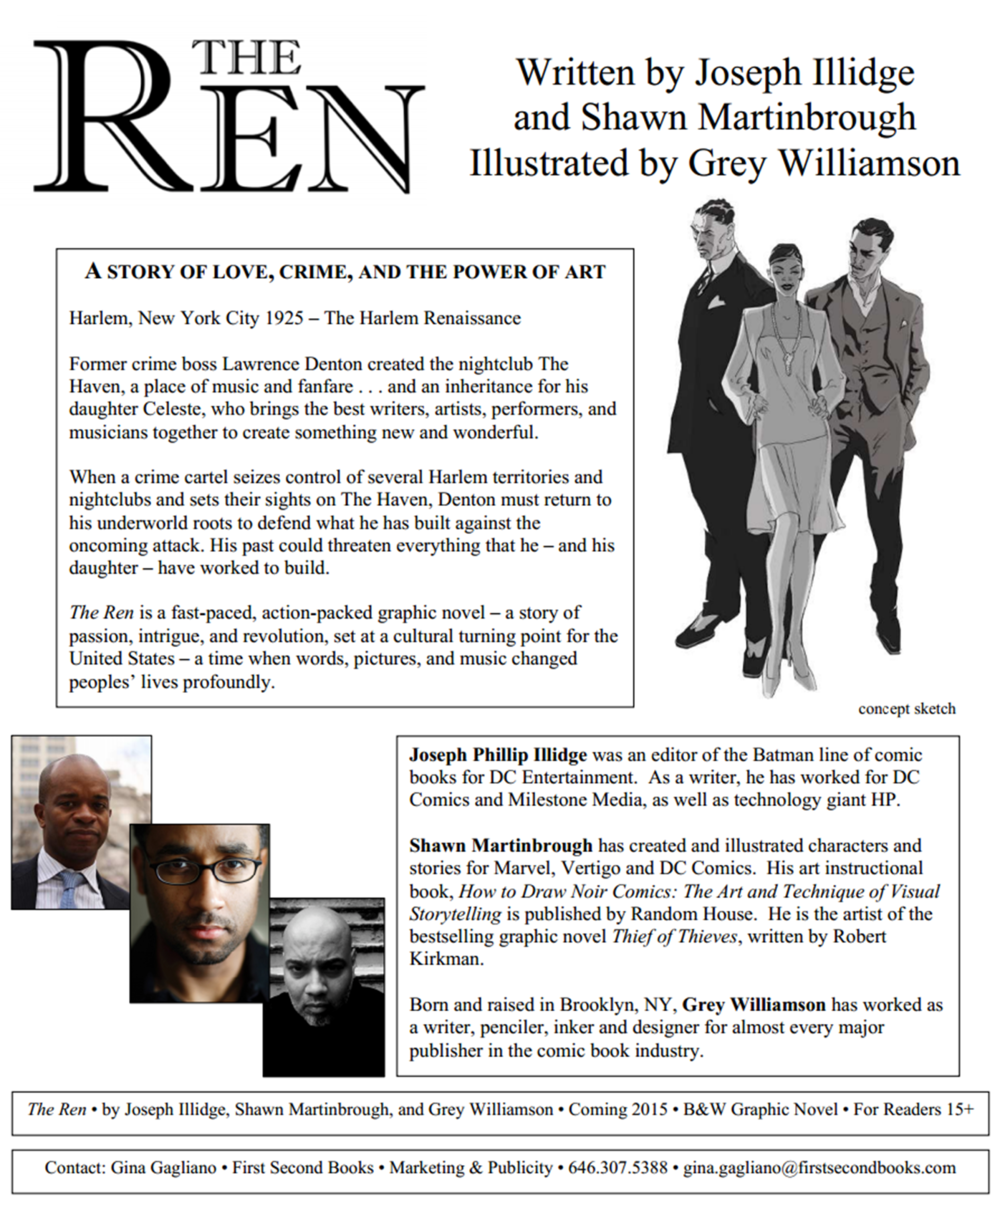 graphic_novel_the_ren_harlem_renaissance_martinbrough_illidge_grey_williamson.png